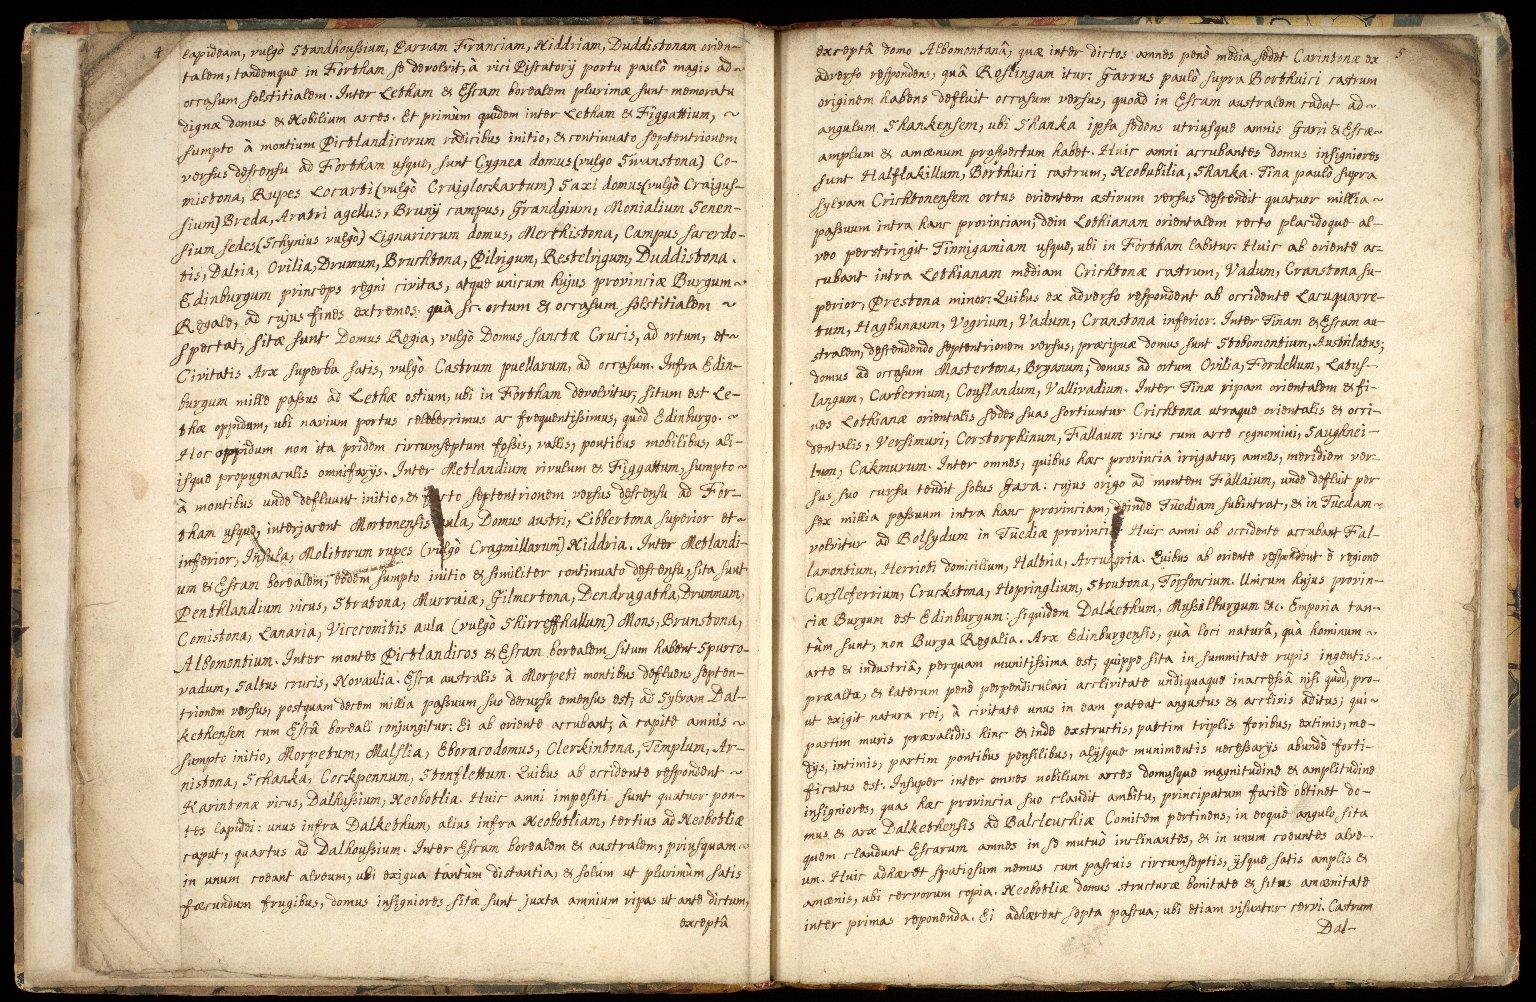 Provincia Edinburgena descriptio. [4 of 7]